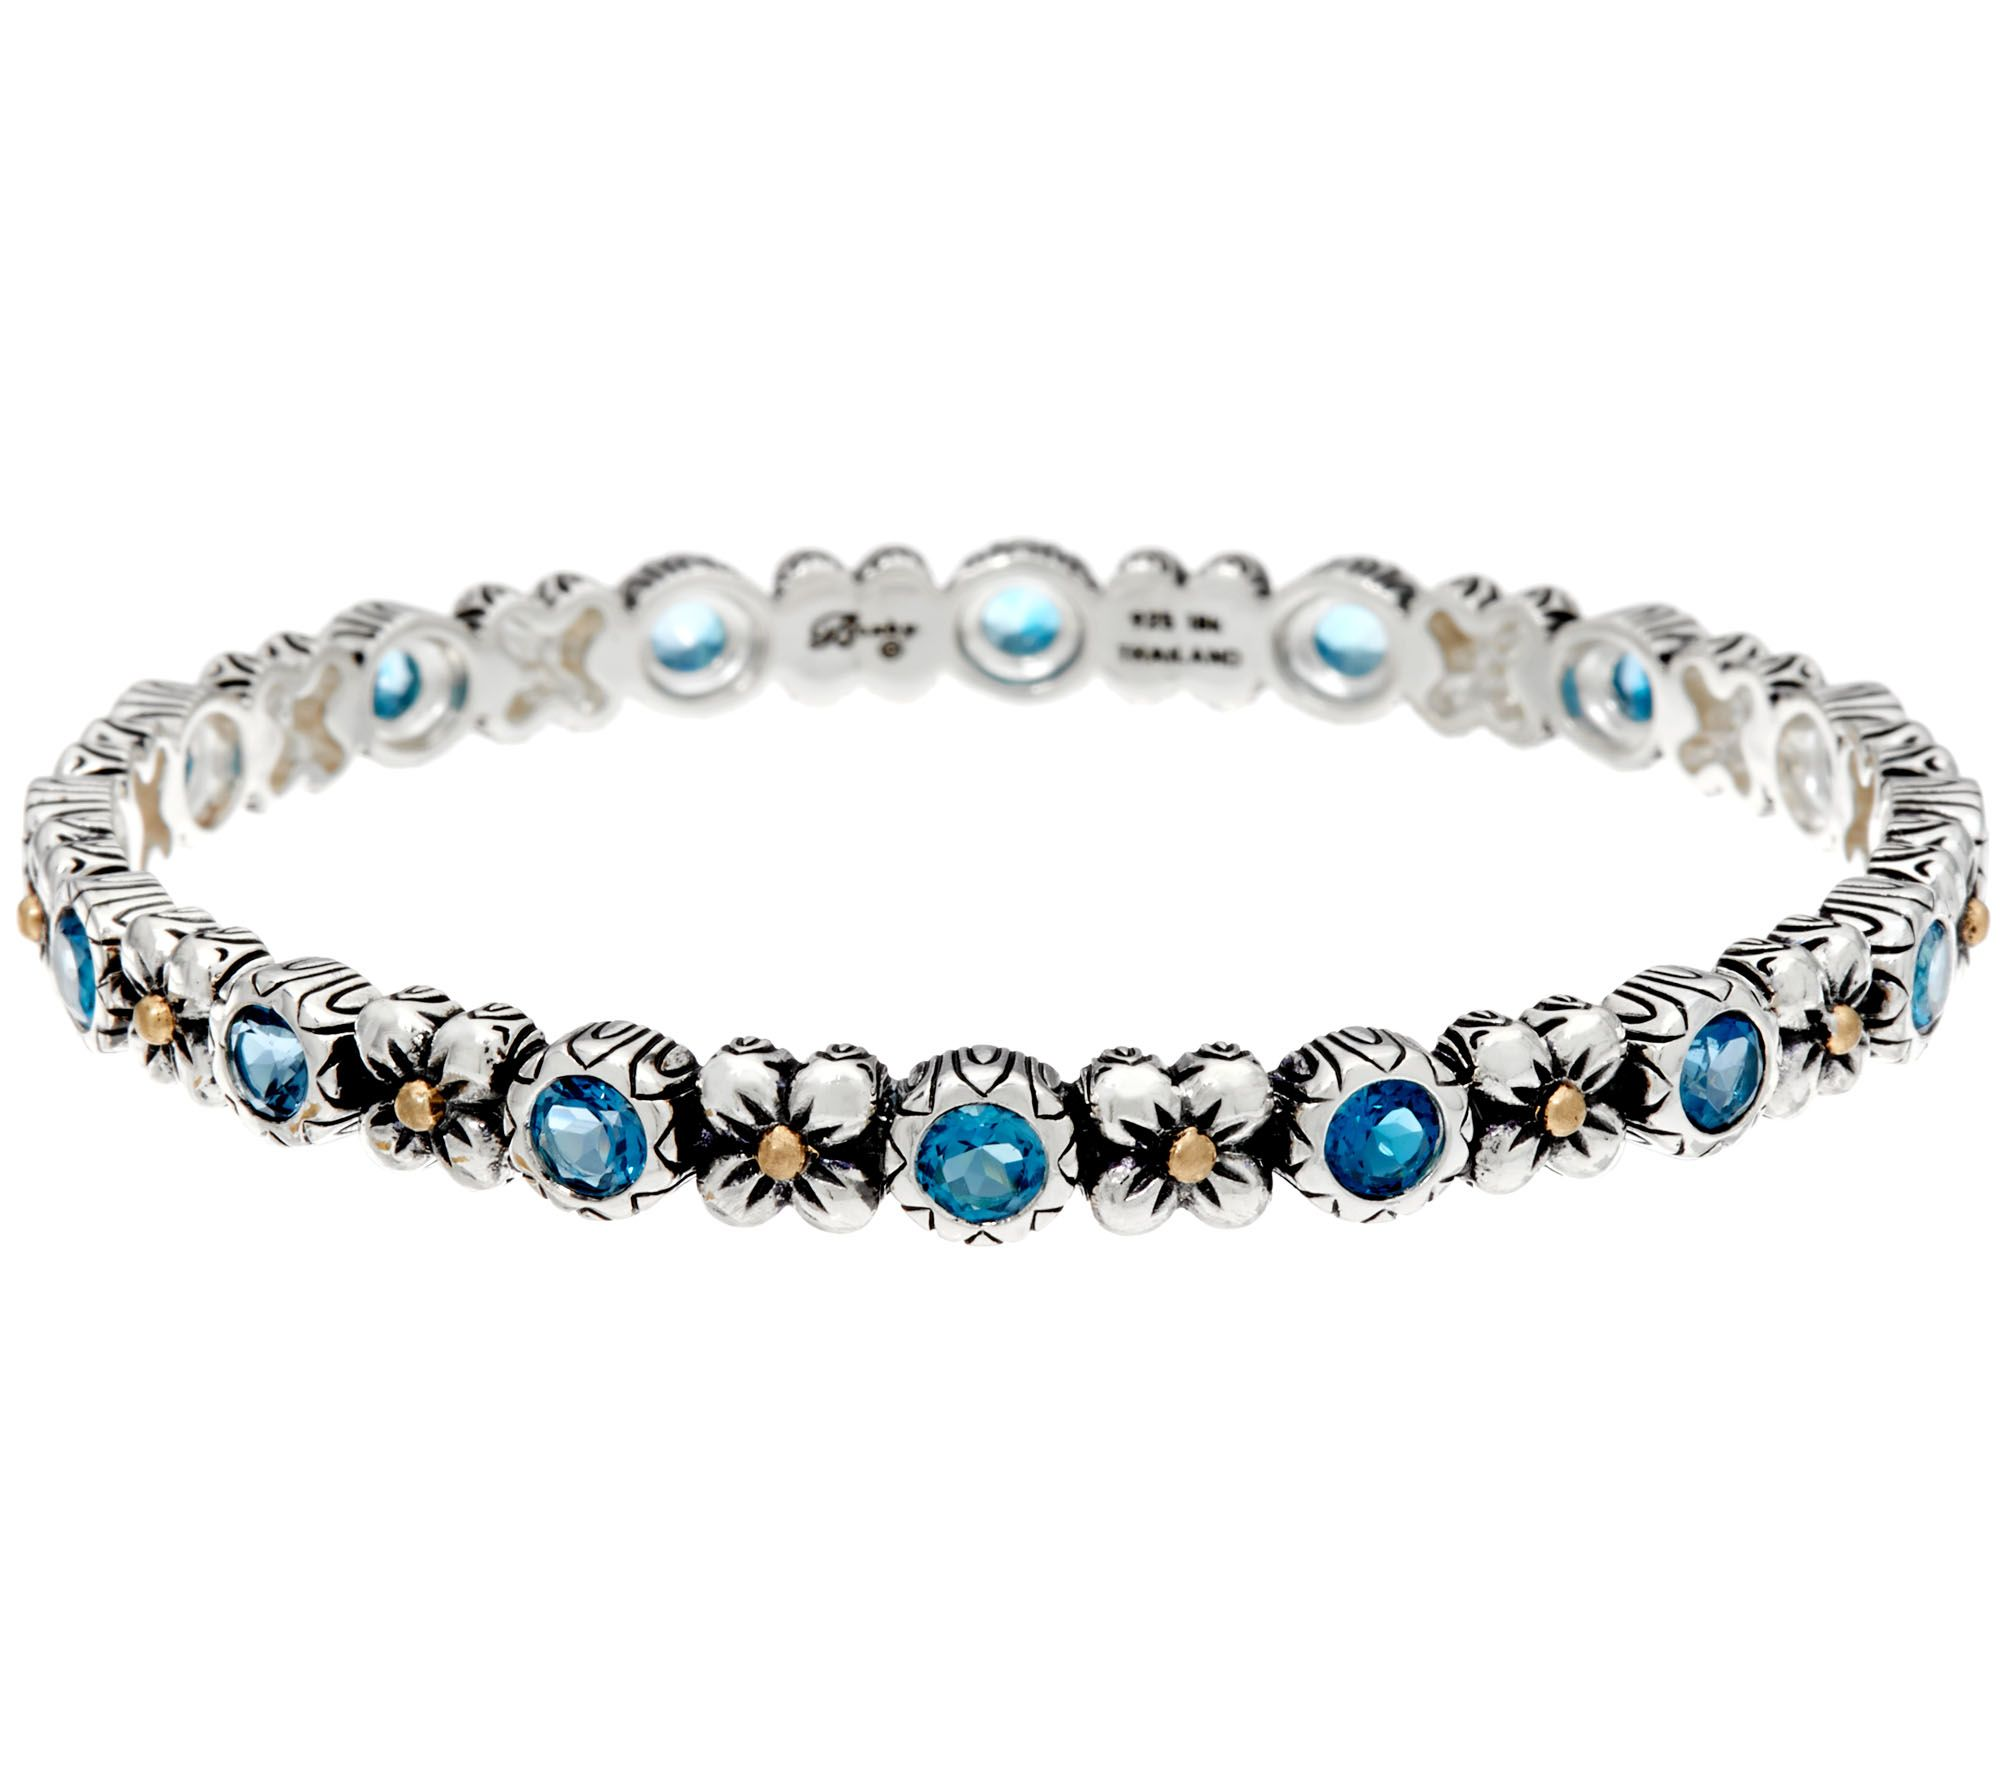 jewelry bracelets barbara bixby sterling u0026 18k flower u0026 gemstone bangle - j331627 mbrdrue